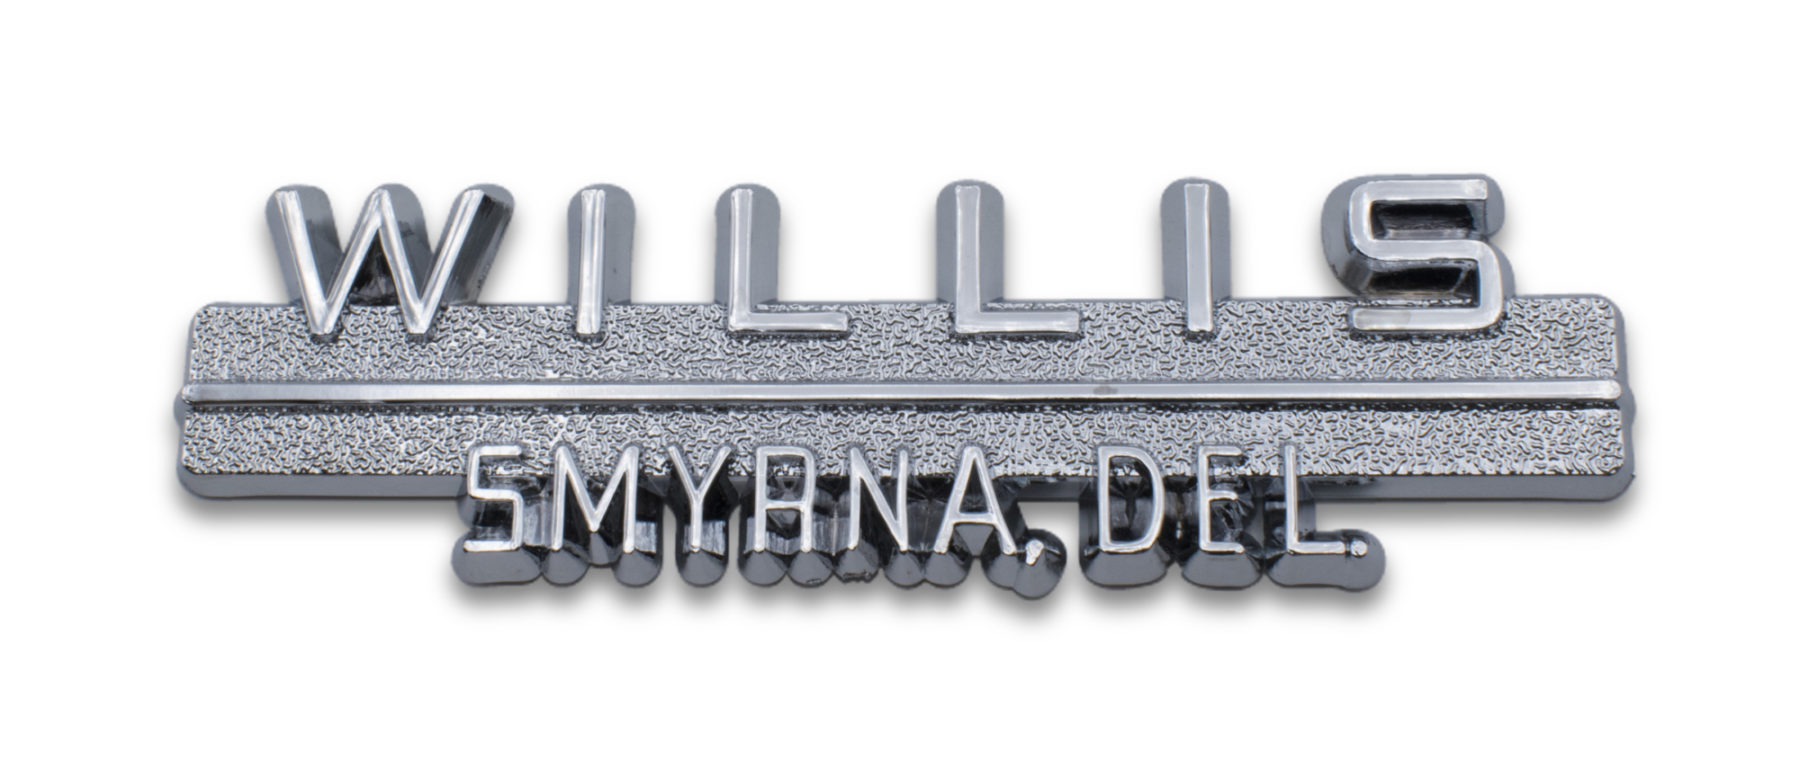 Product Nameplates Elektroplate Chrome Auto Emblems